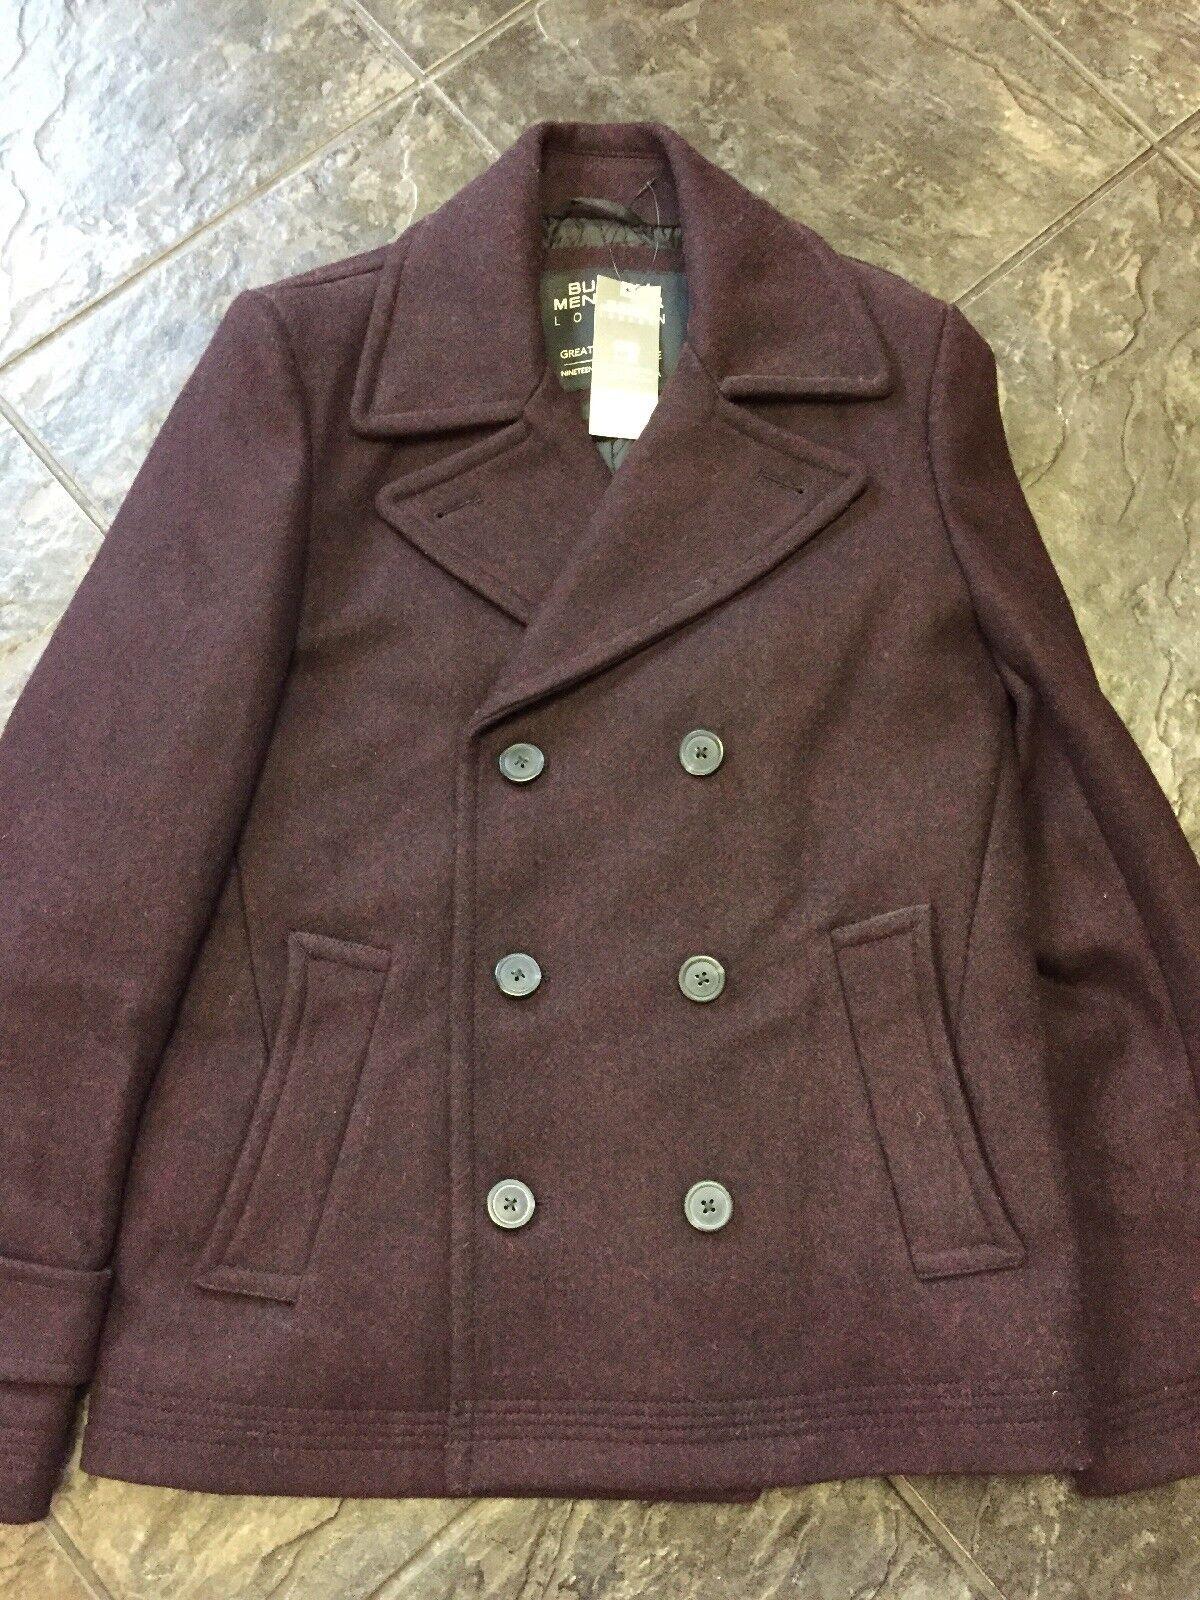 BNWT Mens Wool Blend Burgundy Smart Winter Coat Size Small